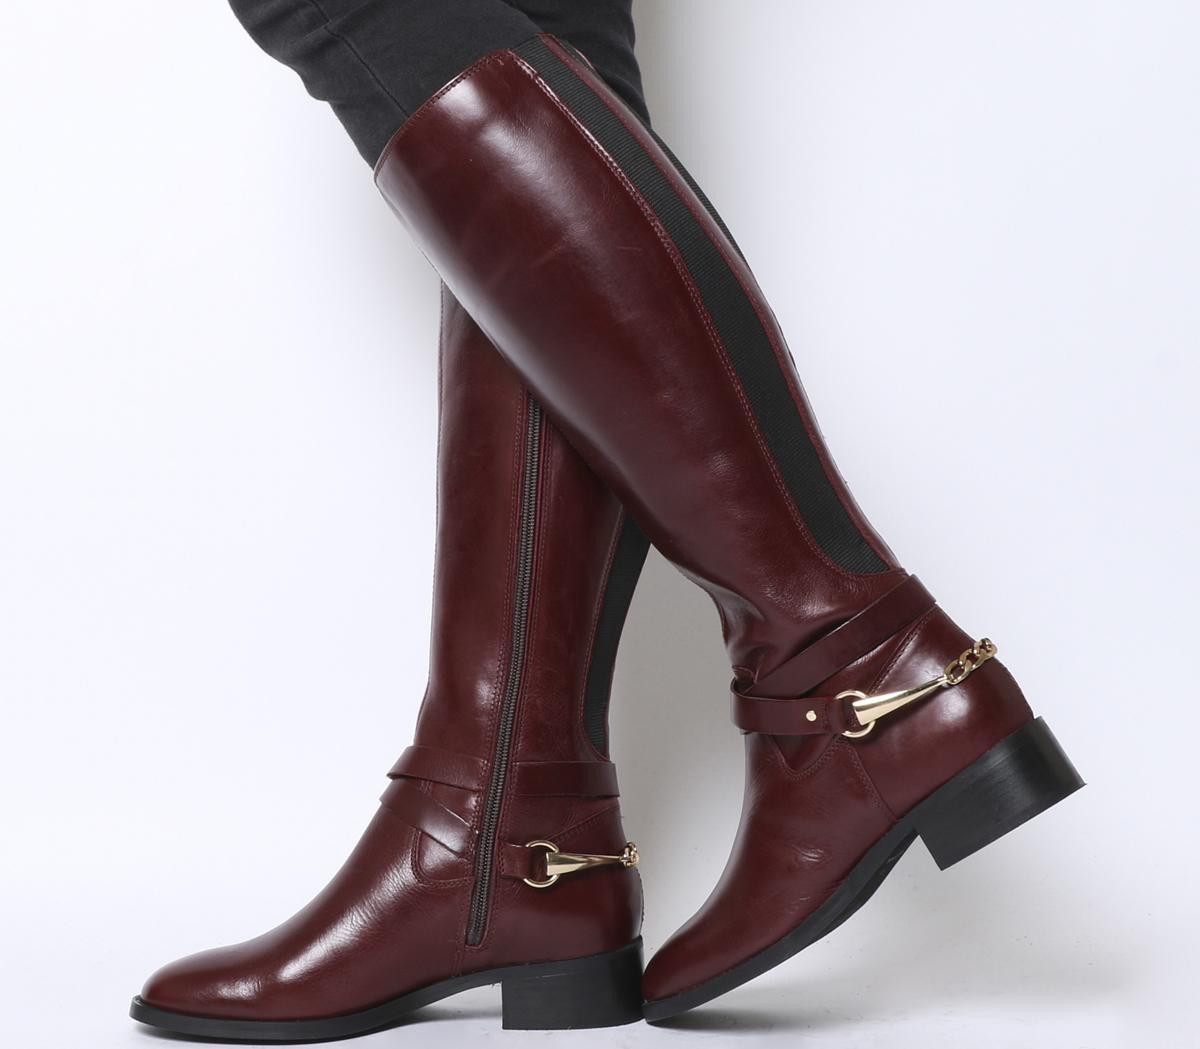 Klink Smart Chain Detail Riding Boots